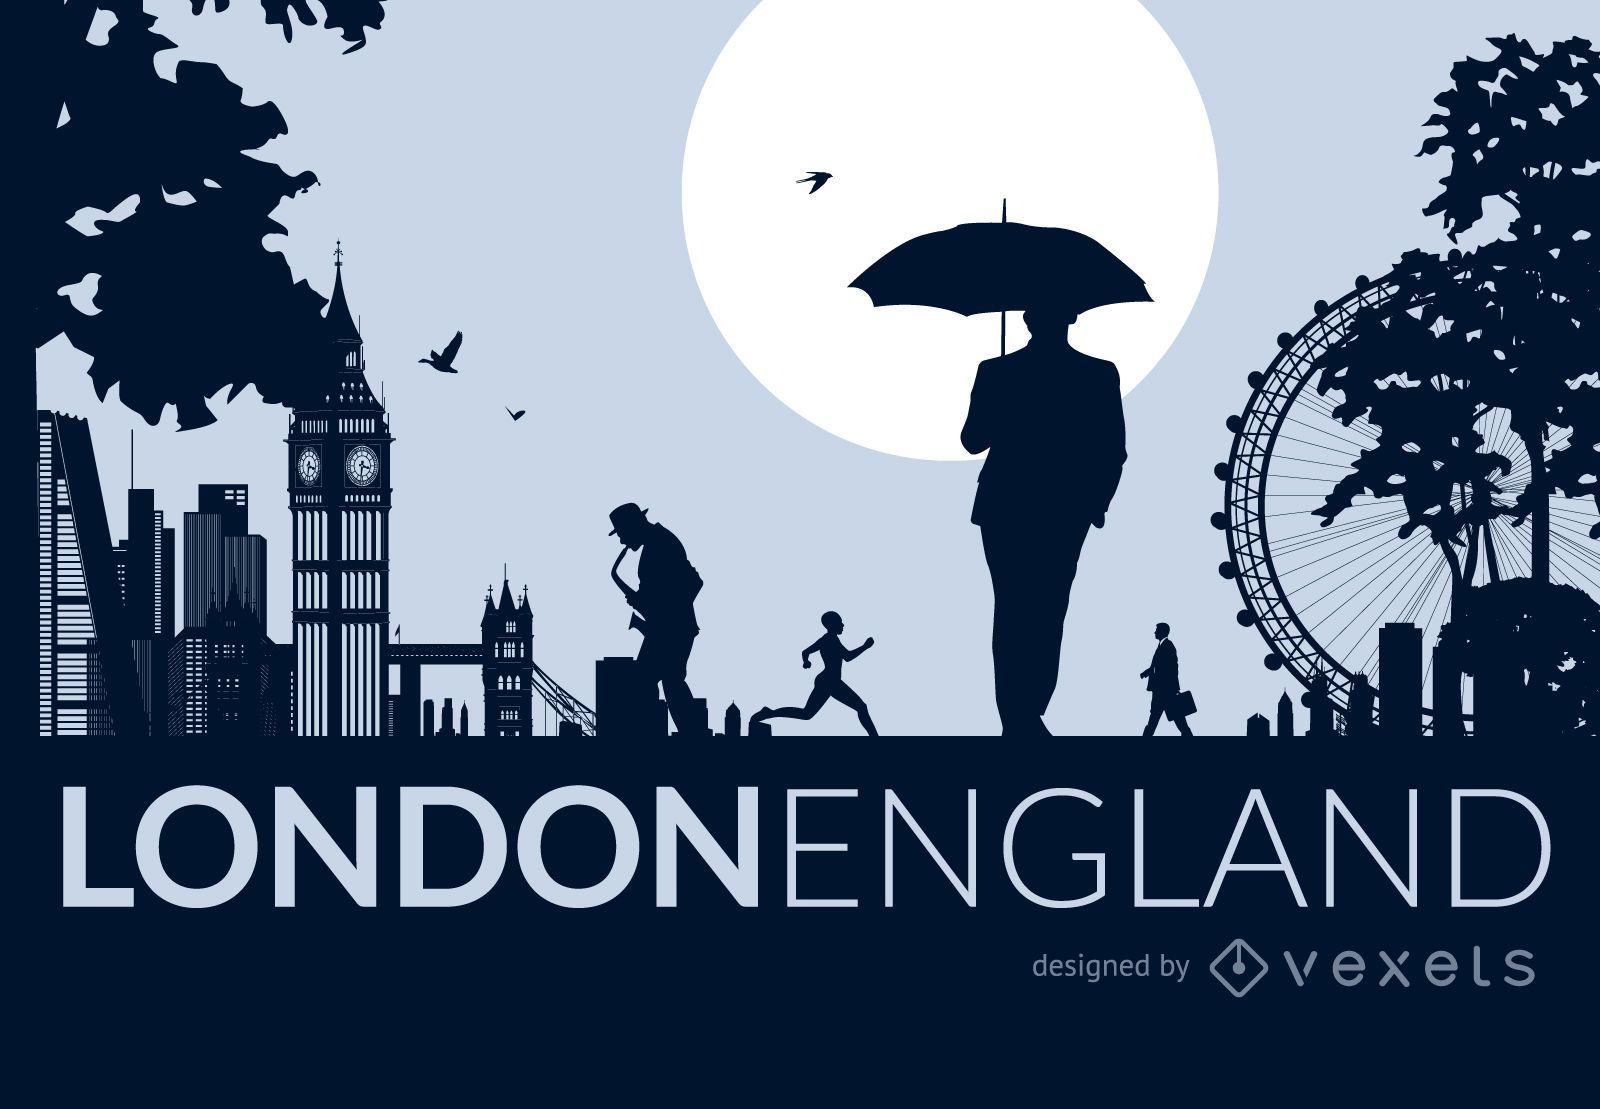 London city skyline with people